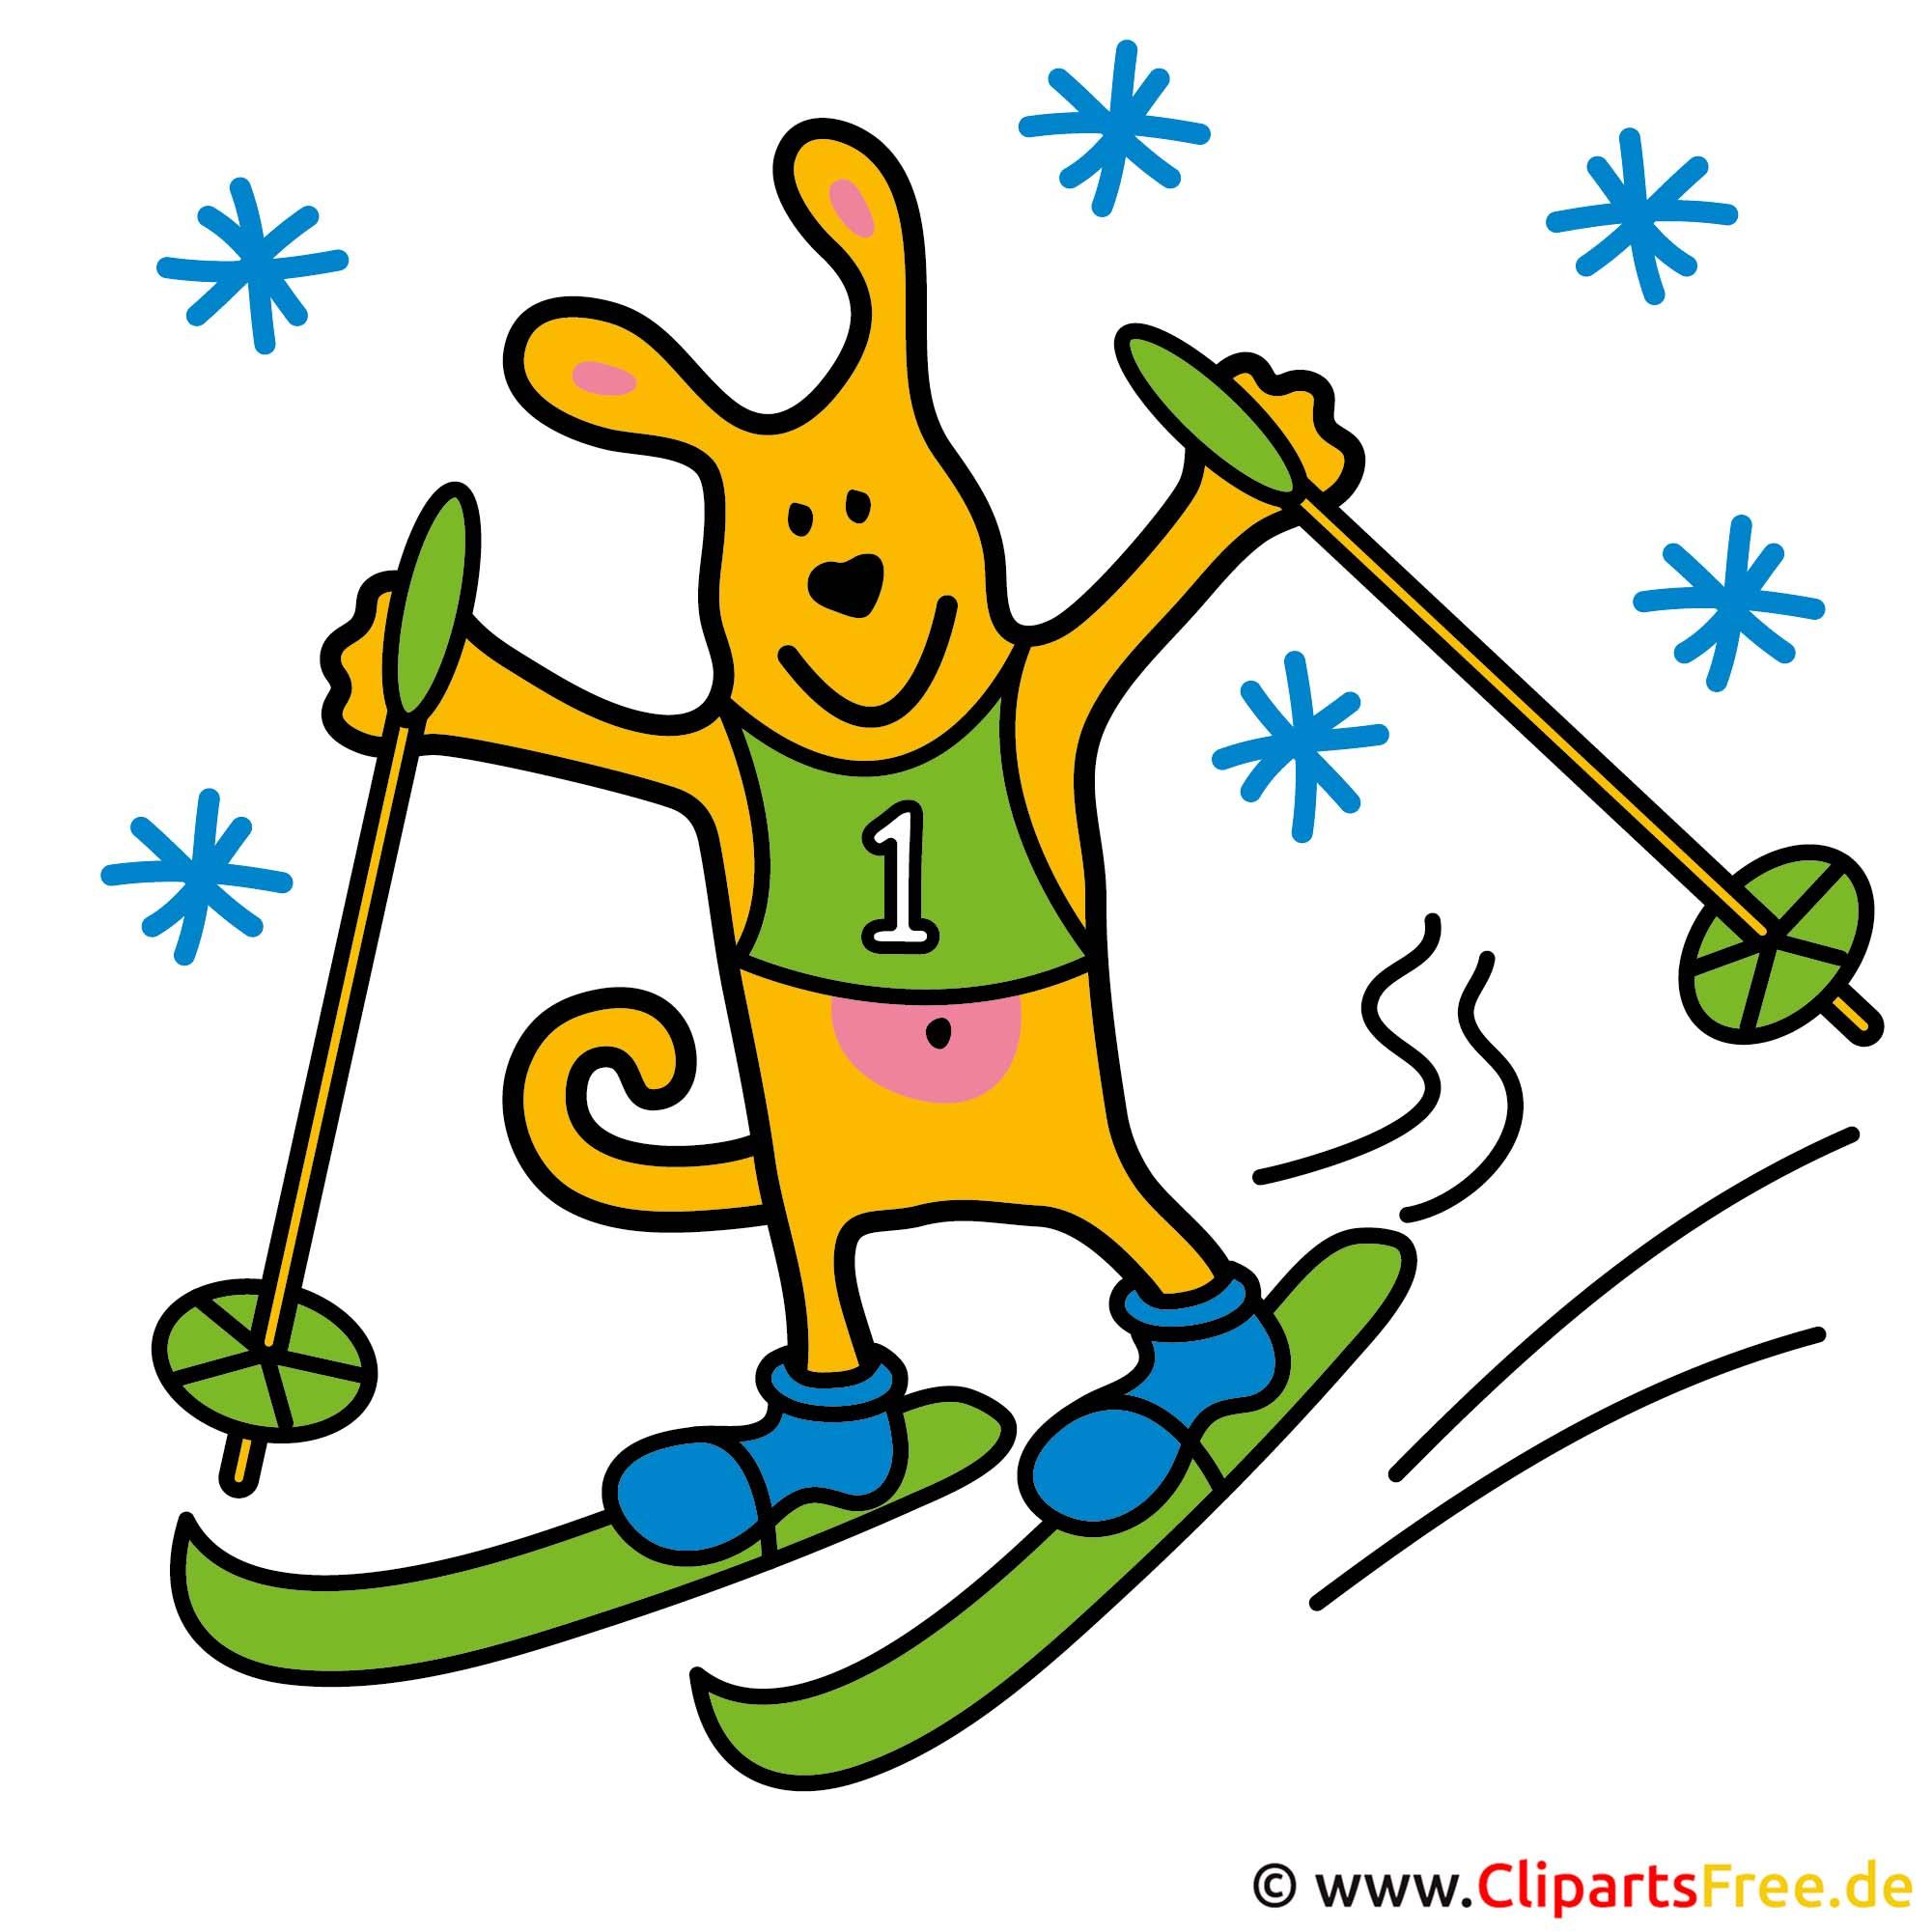 Ski Clipart - Sportbilder gratis